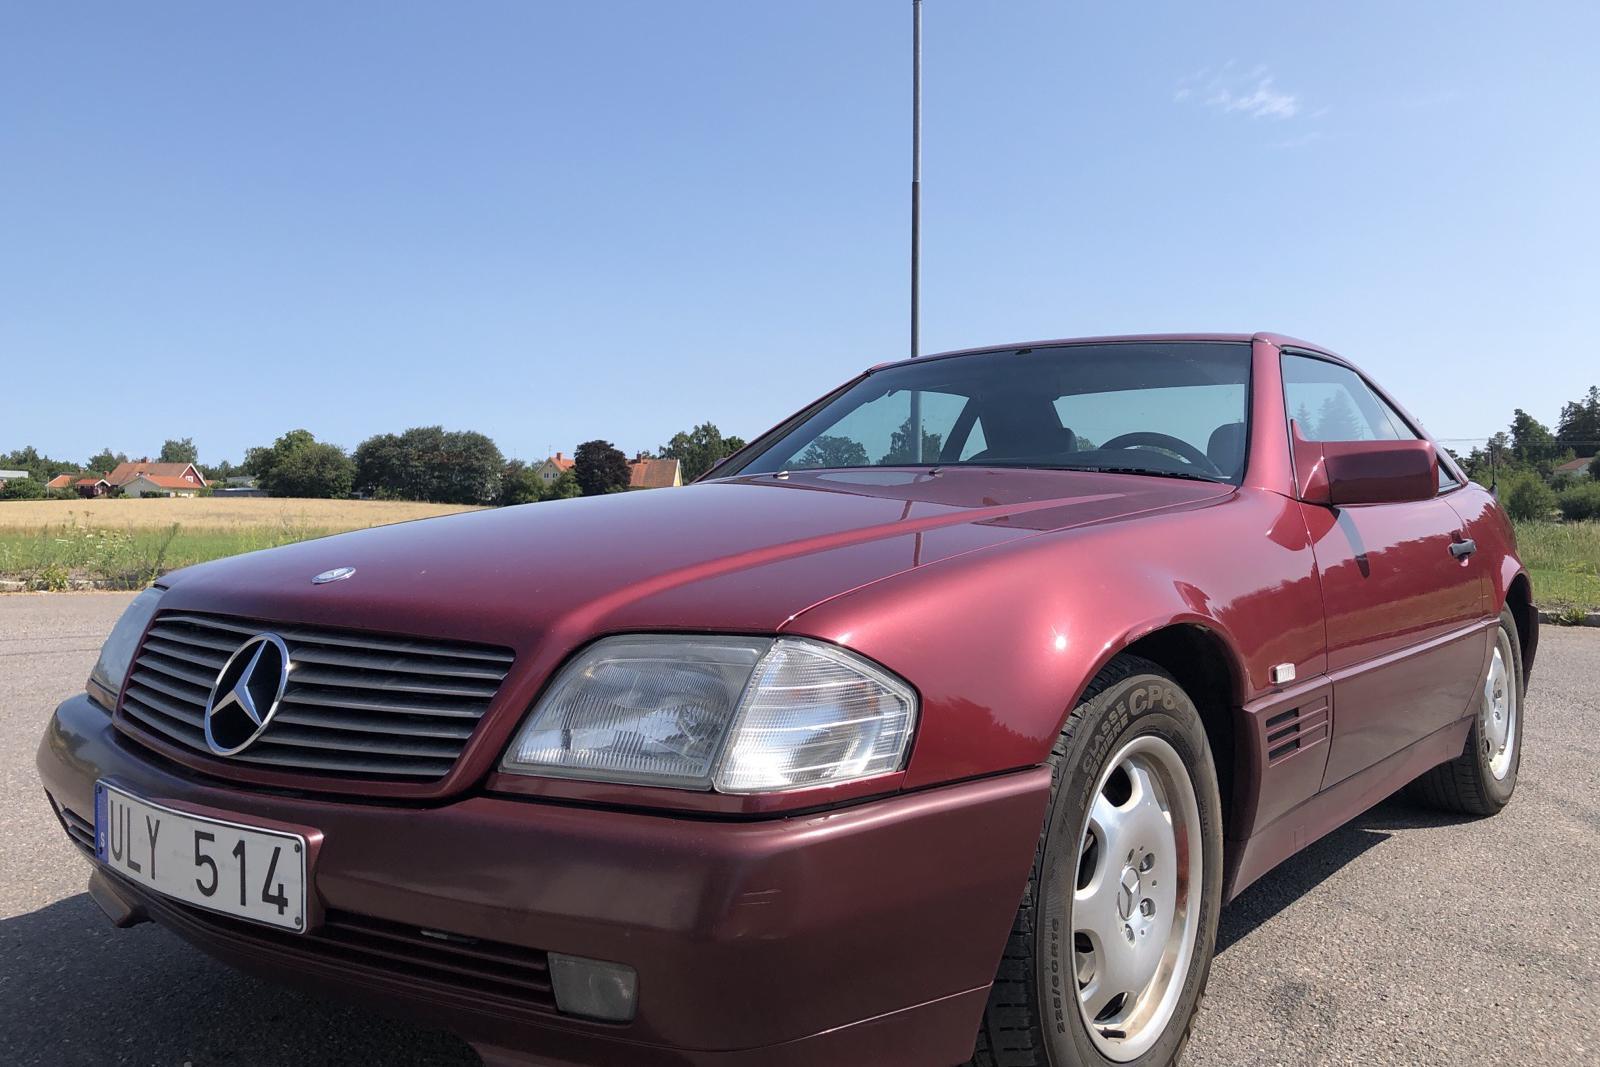 Mercedes SL 500 R129 (320hk) - 152 810 km - Automatic - red - 1994